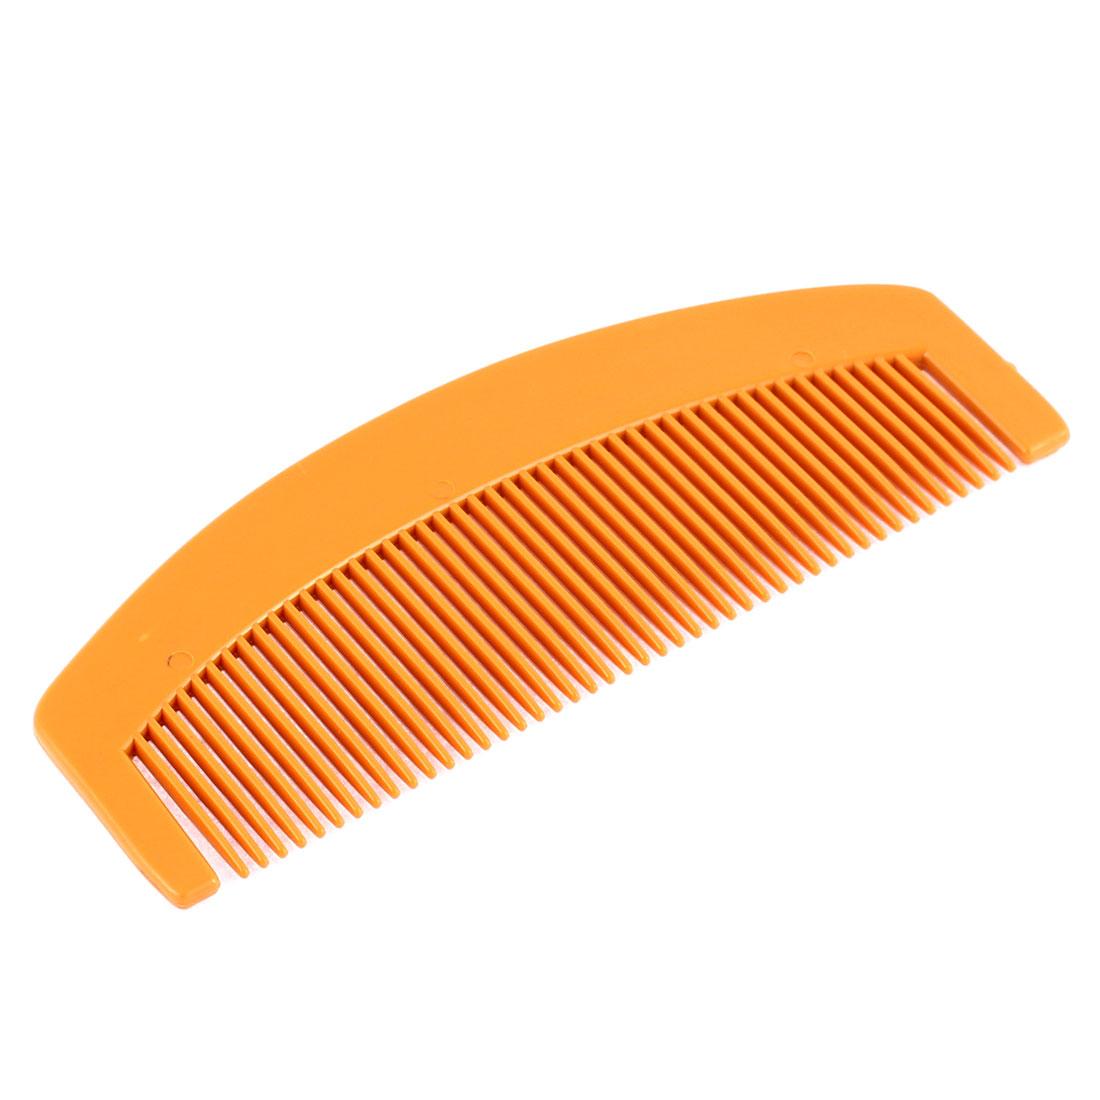 Unisex Plastic Narrow Toothed Crescent Shape Portable Comb Dark Khaki